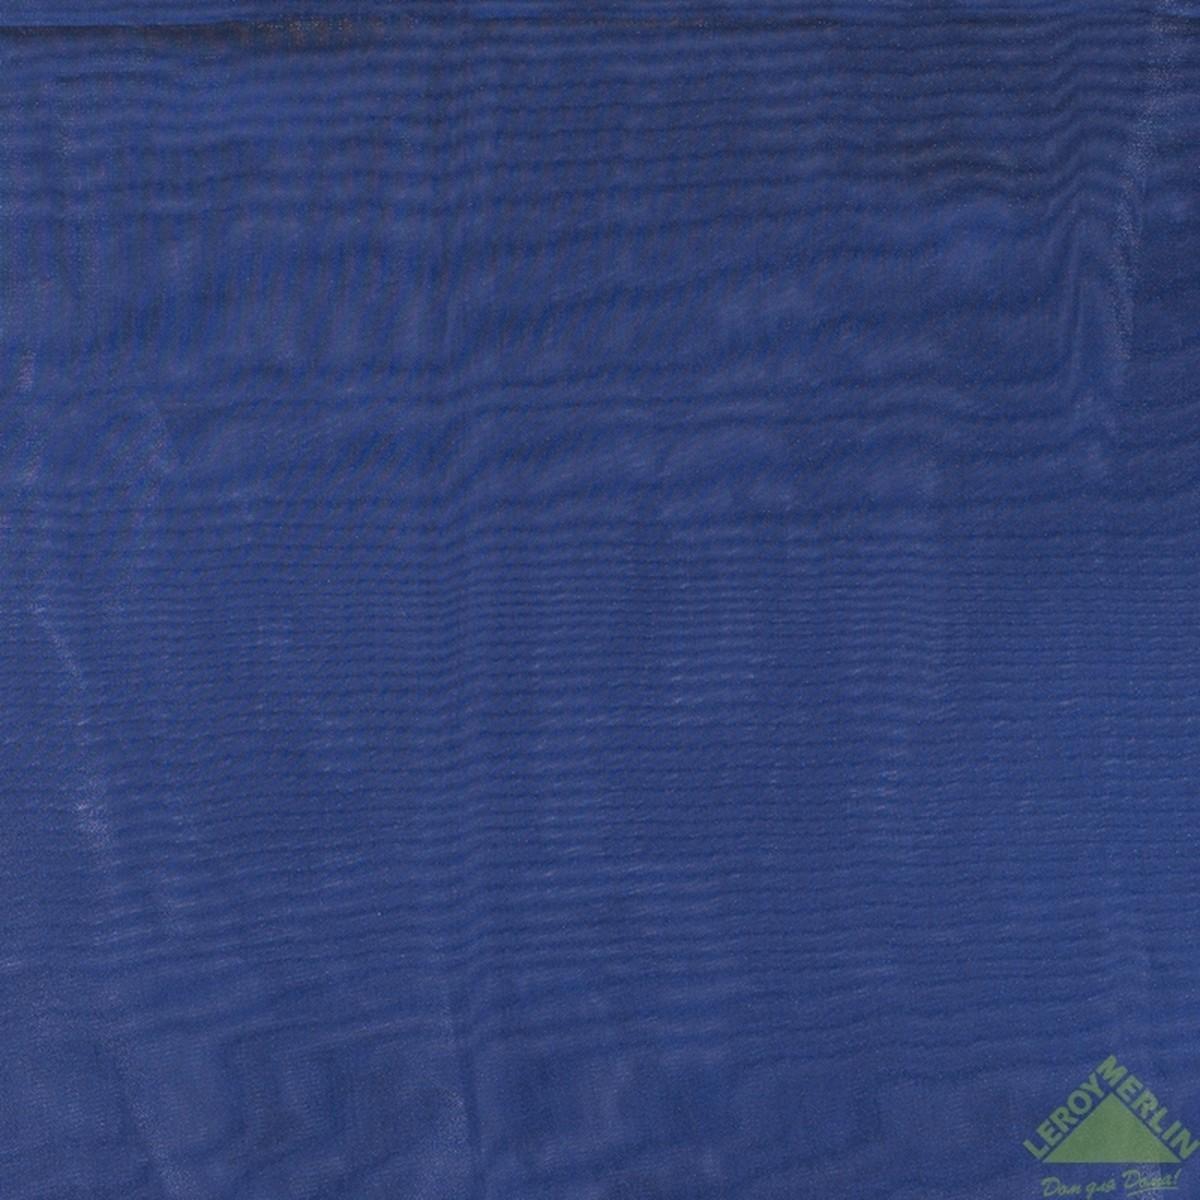 Тюль органза САТИН однотонный 280 см 1 пог. м